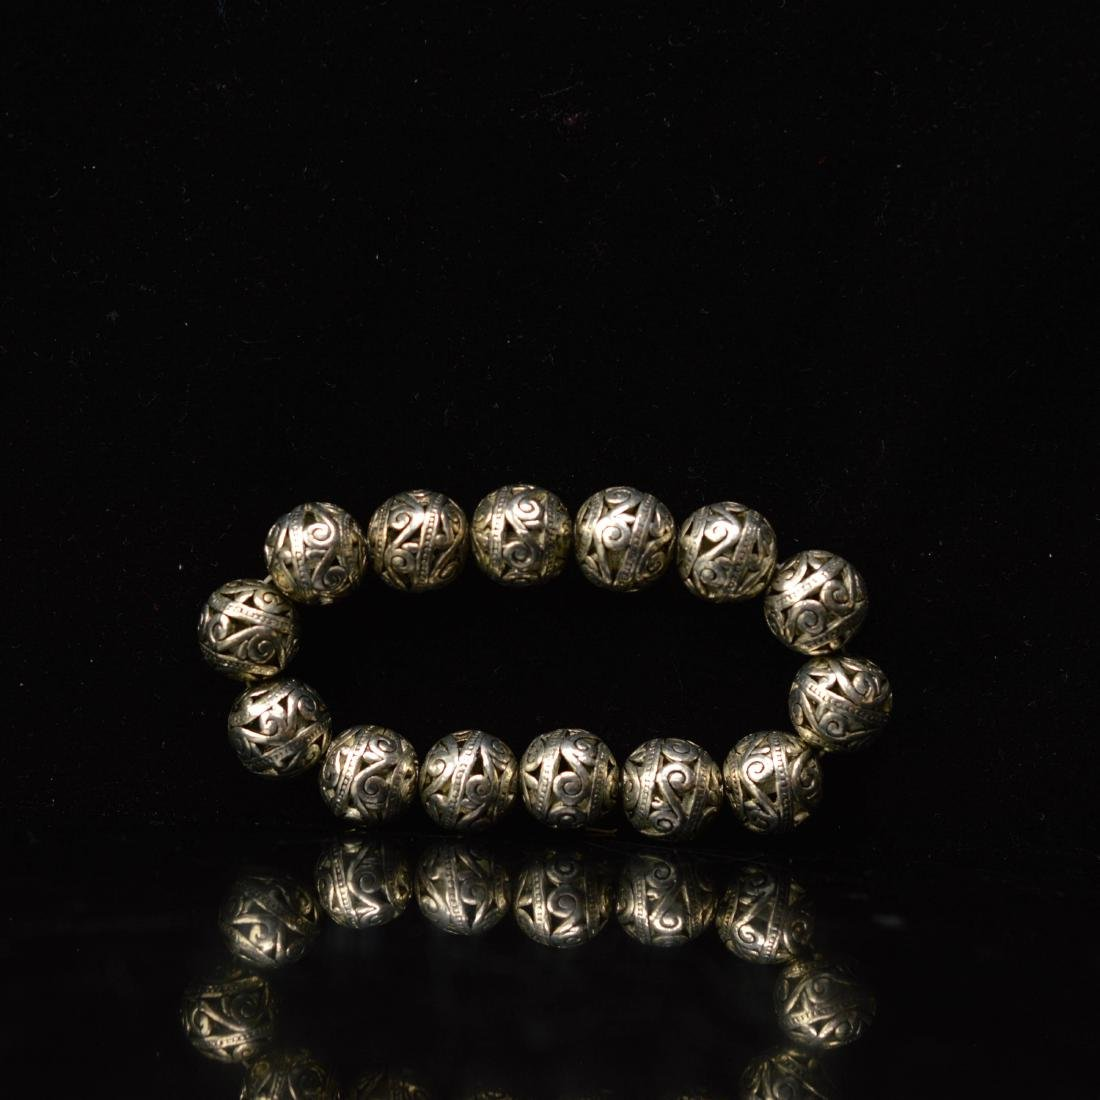 Tebetan silver style beads bracelet